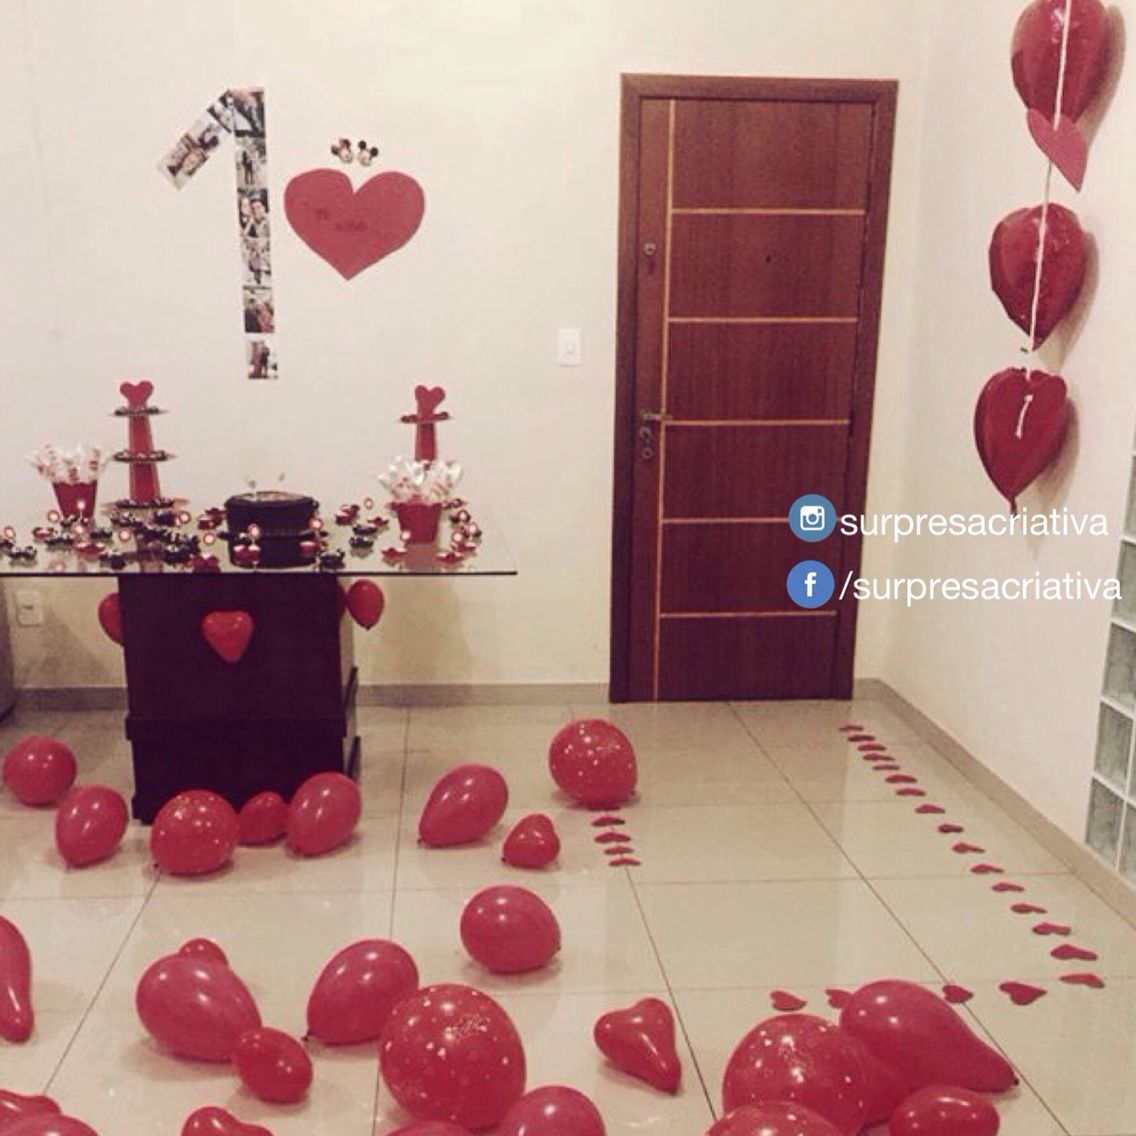 Instagram Com Surpresacriativa Surpresas Para Namorado